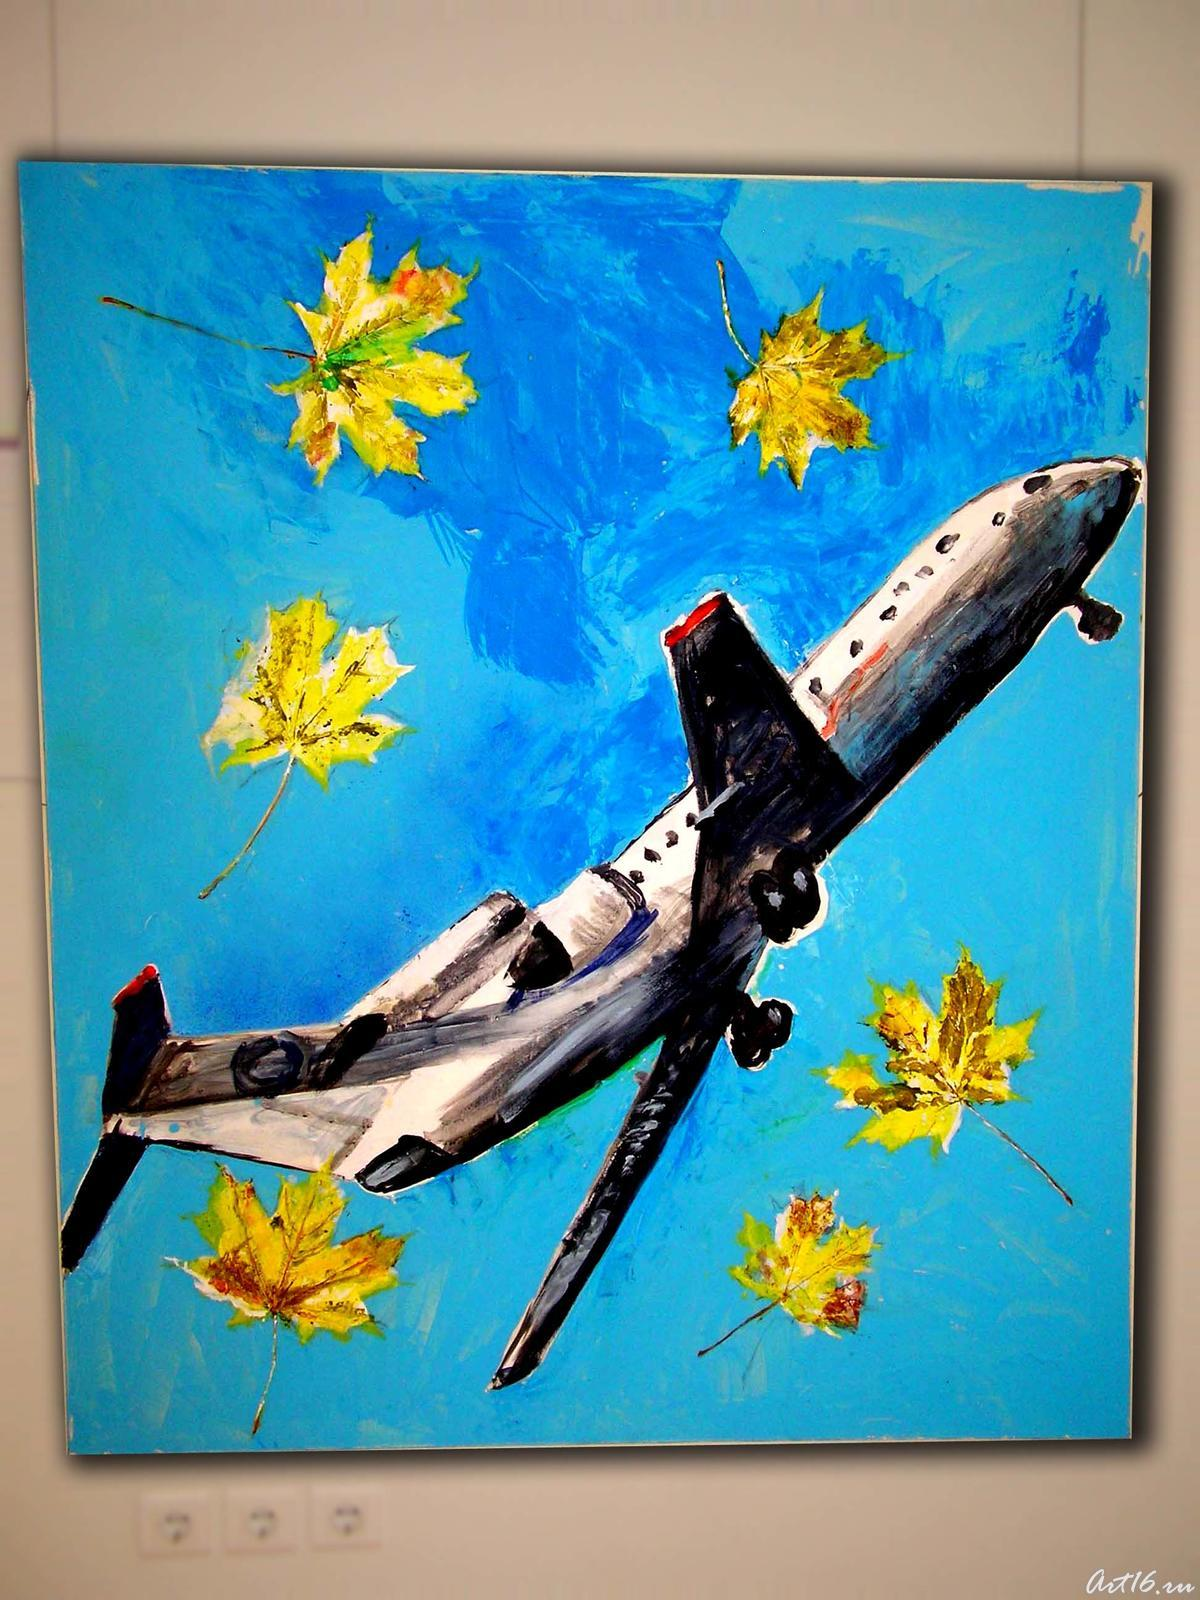 Фото №2408. Самолёт. 2007. Лысяков В.Н.